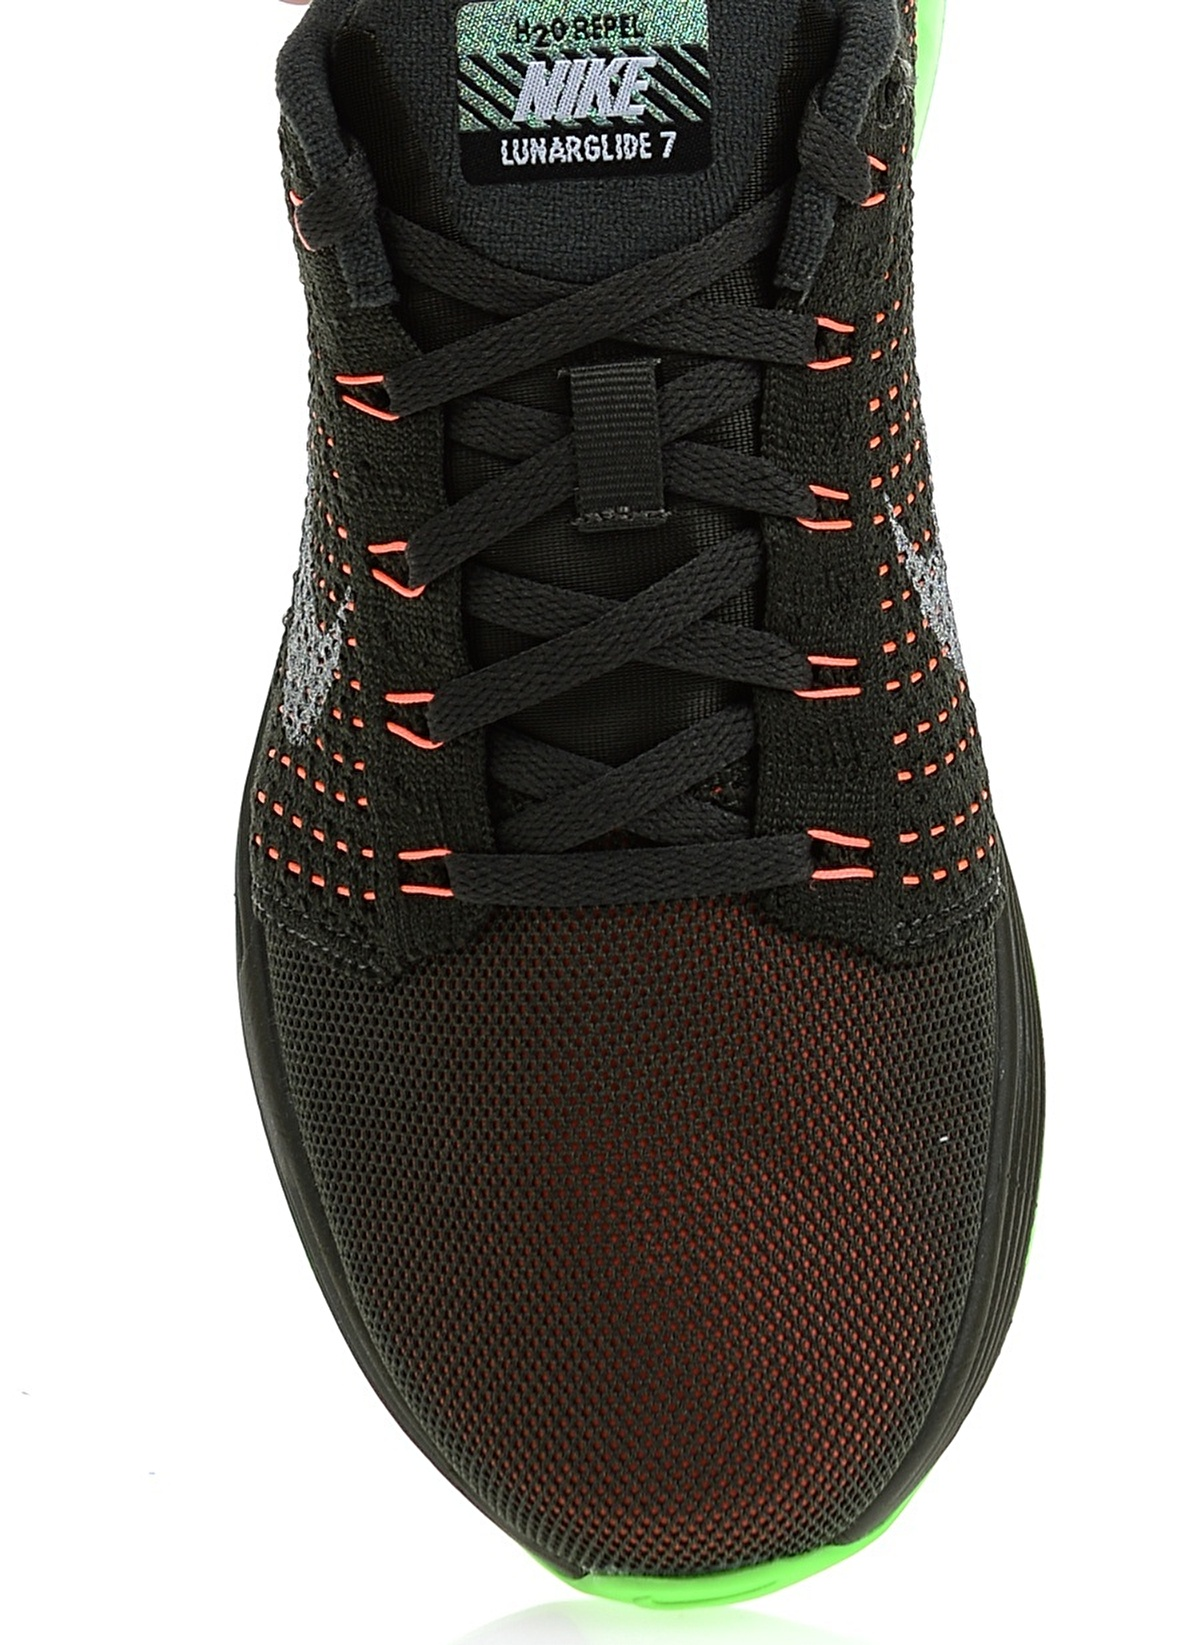 803567-300 Wmns Nike Lunarglide 7 Flash,Sequoia/Rf